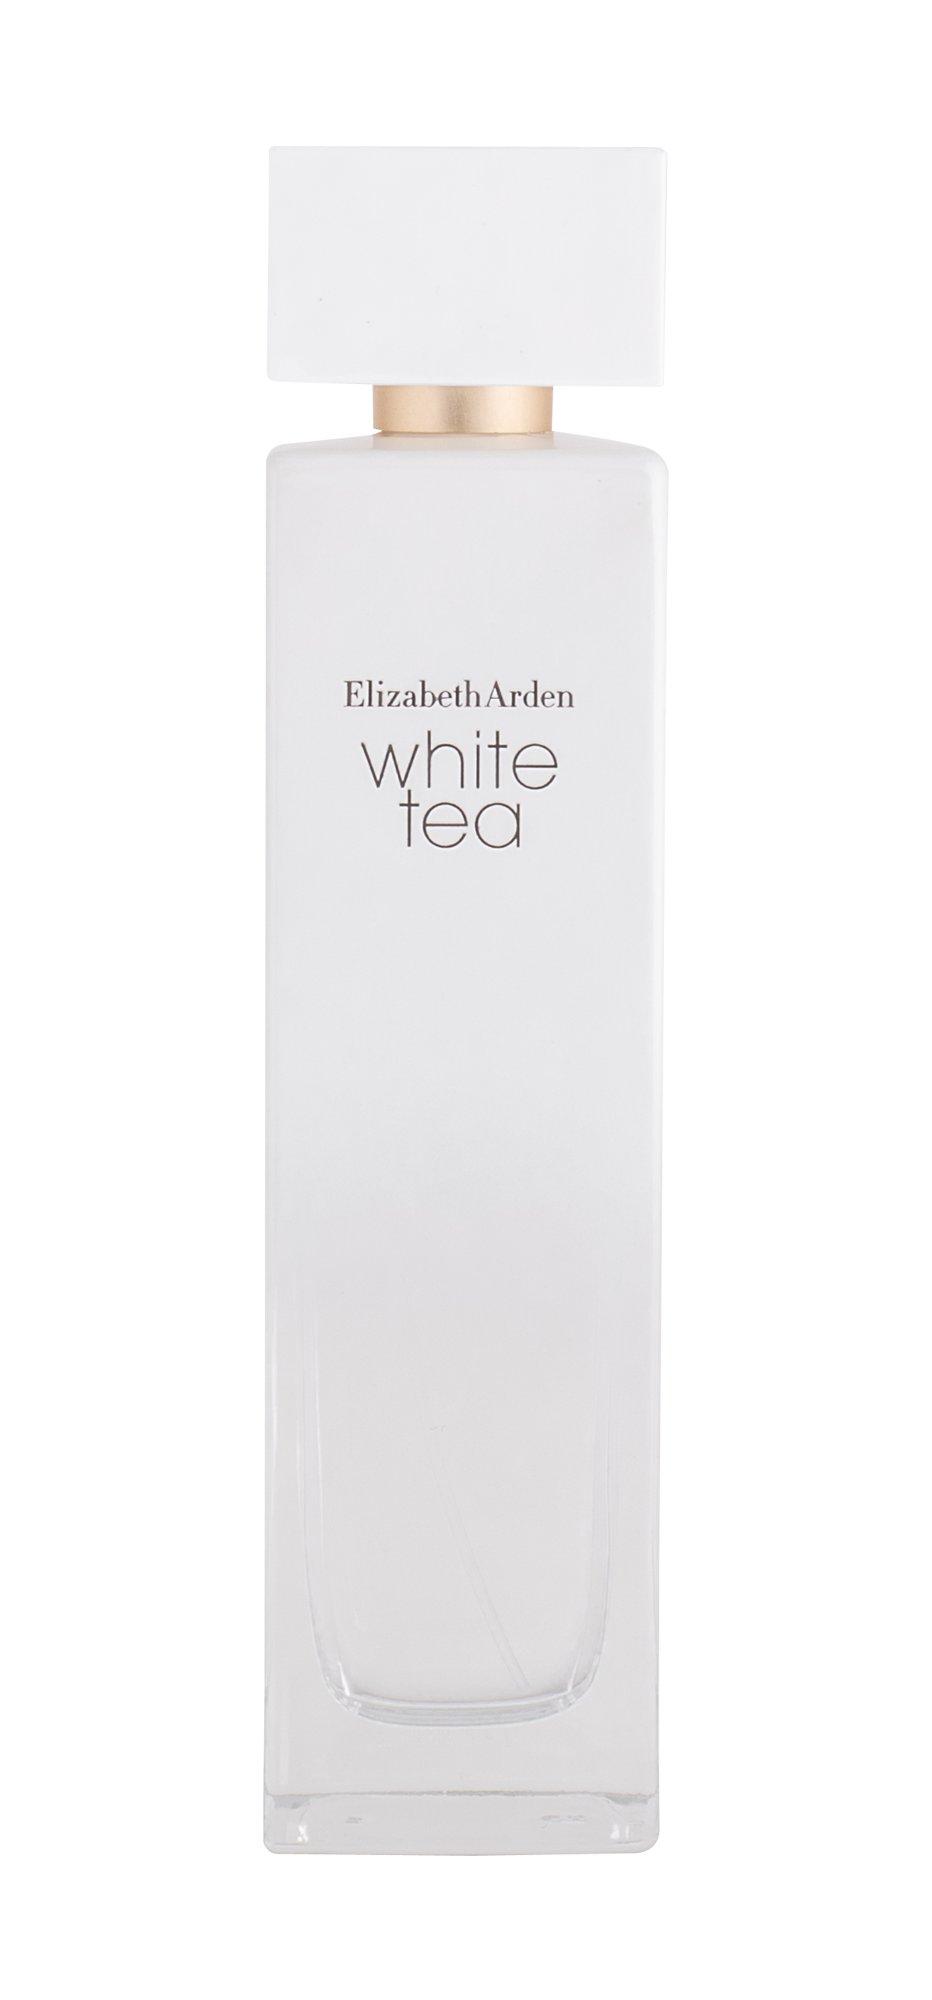 Elizabeth Arden White Tea, Toaletná voda 100ml